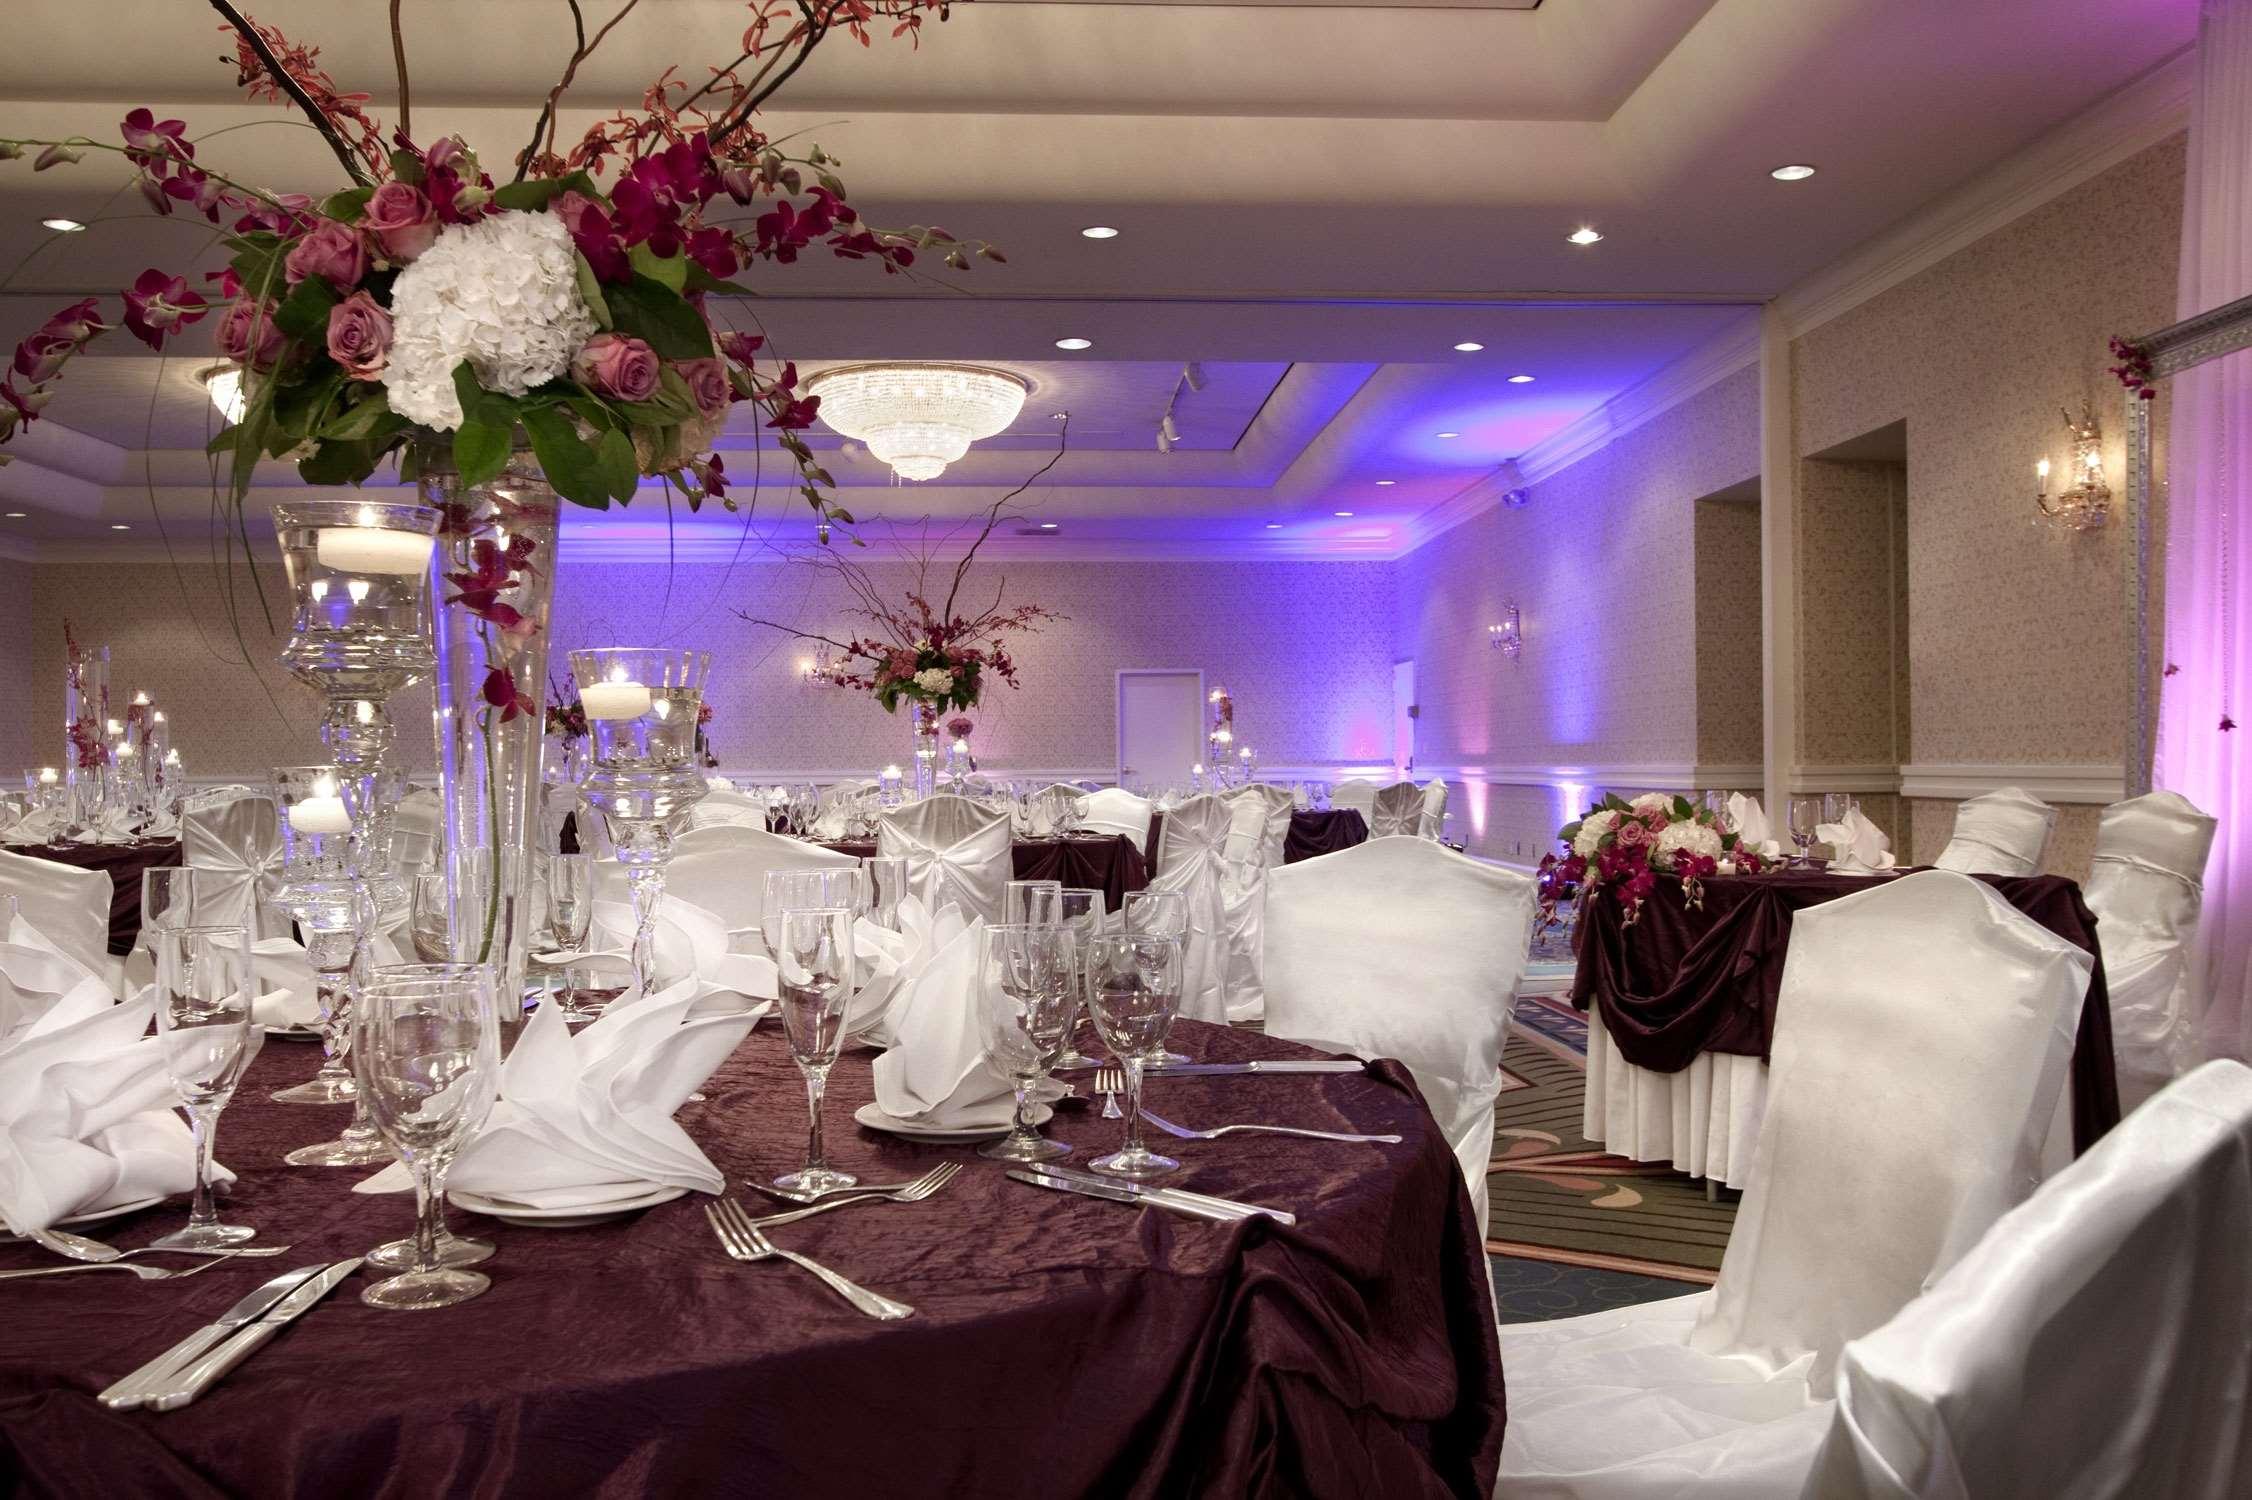 Hilton Washington DC/Rockville Hotel & Executive Meeting Ctr image 46